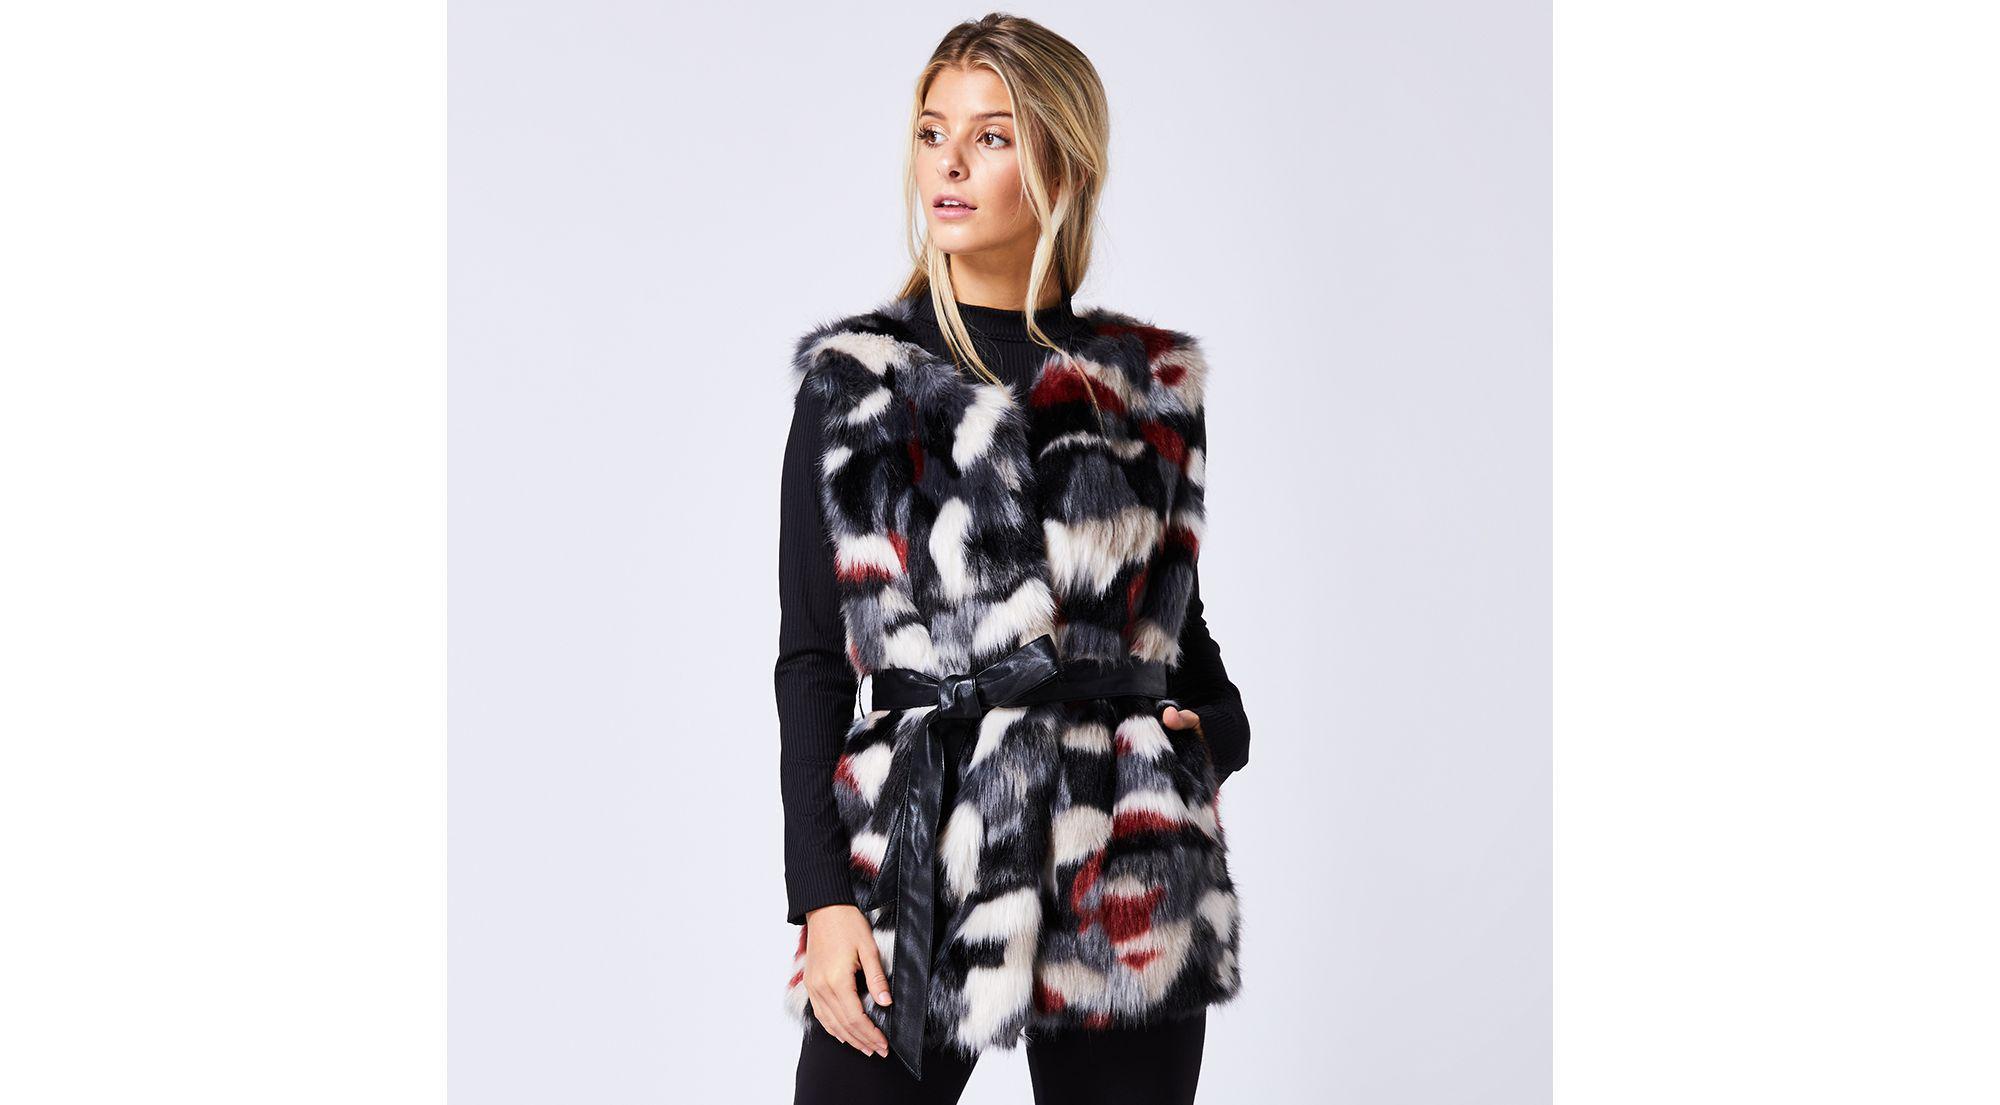 Angeleye Multicoloured Sleeveless Faux Fur Gilet in Black - Lyst a98f983c9e8